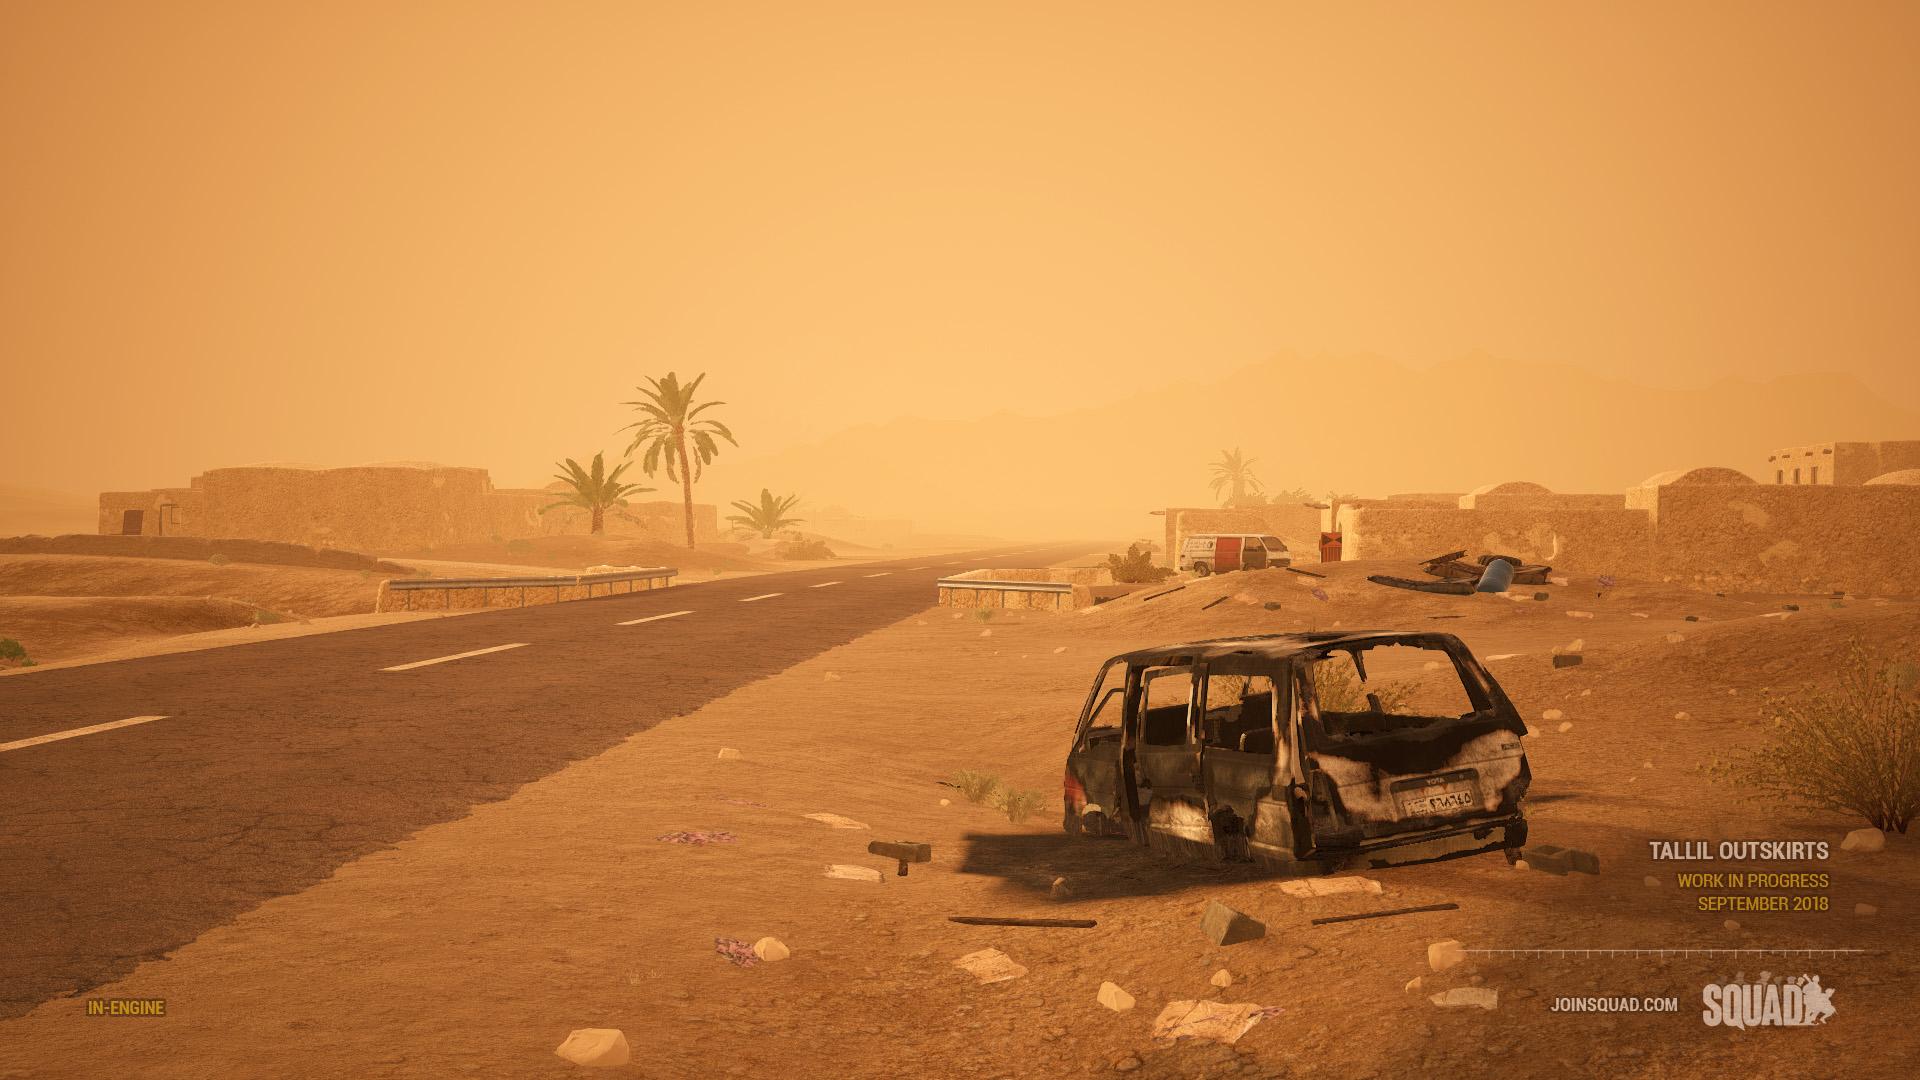 tallil_sandstorm_4.jpg